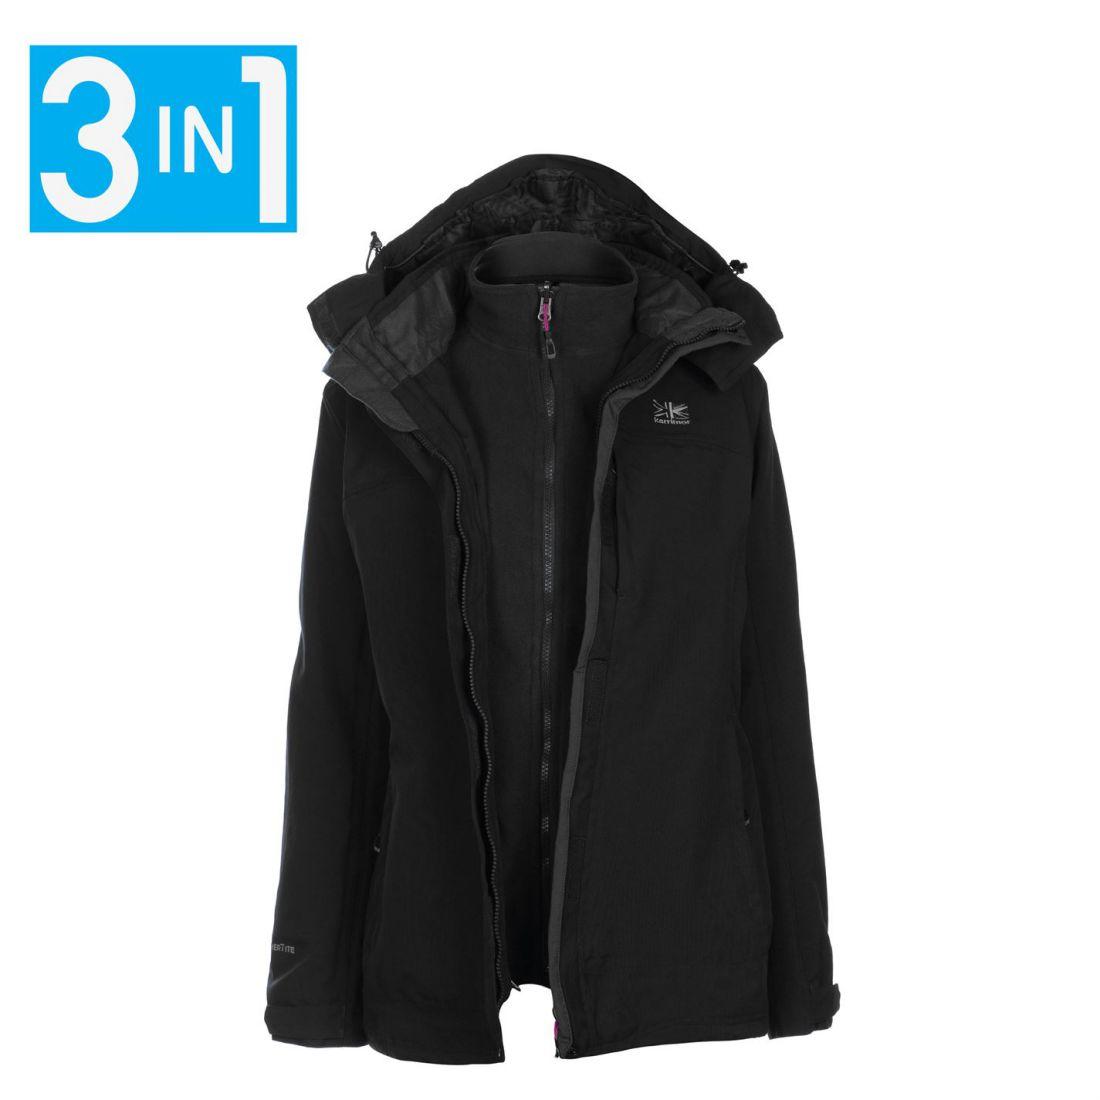 280801cd19 Karrimor Womens 3in1 Jacket Coat Top Ladies Hooded Fleece Mesh ...